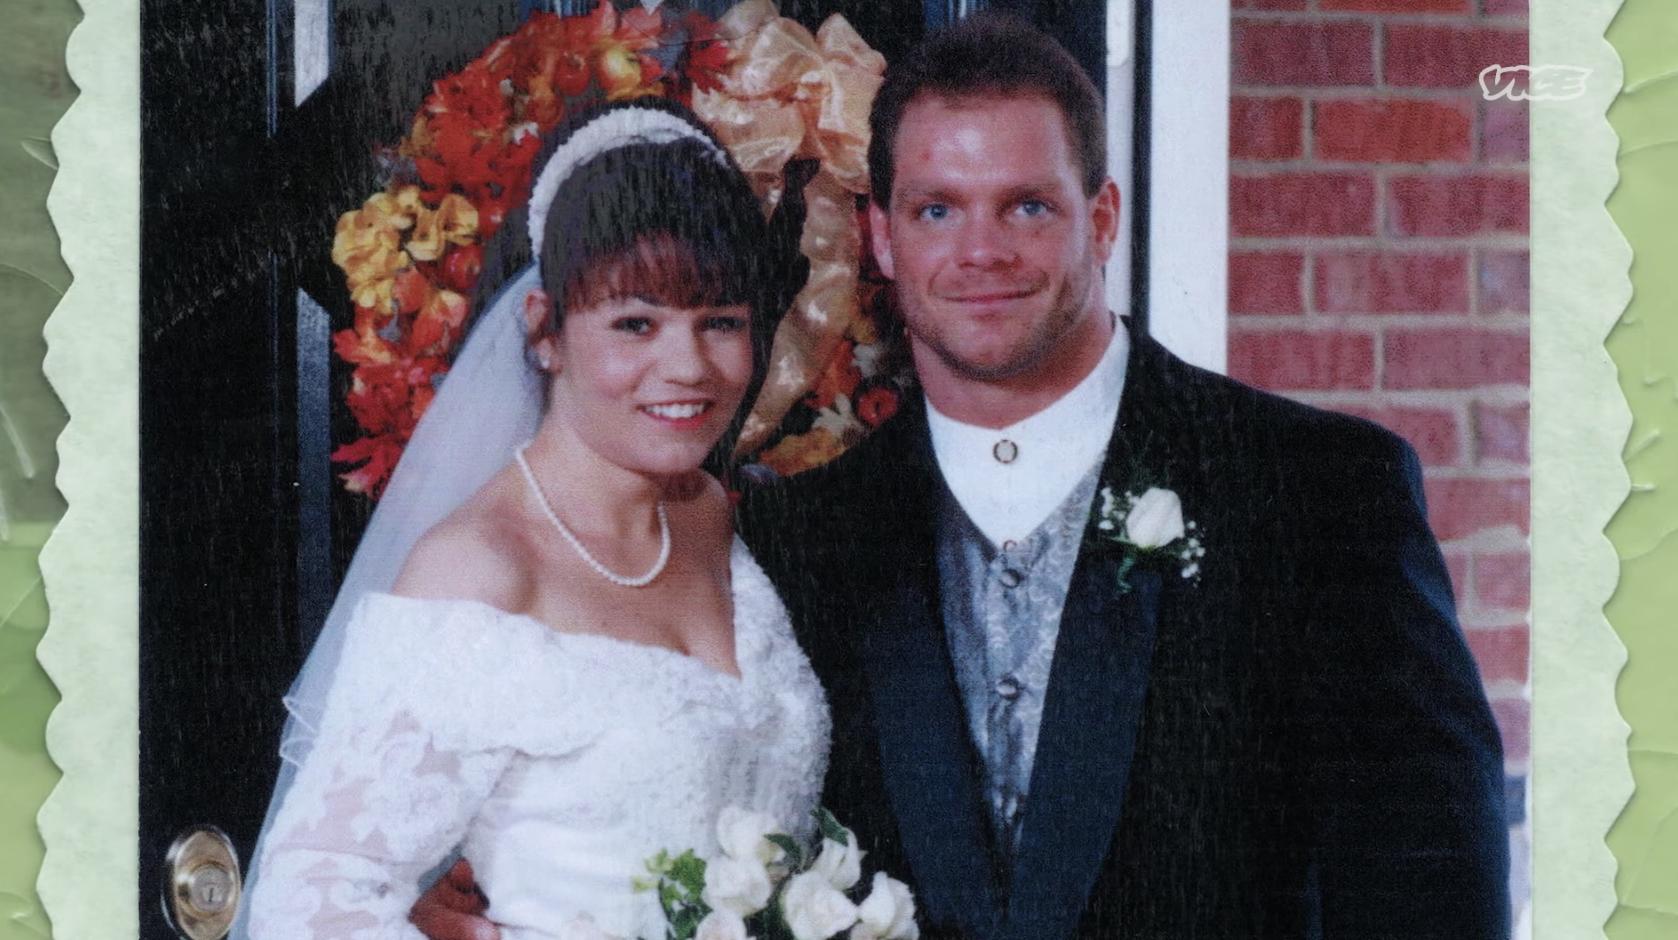 Chris and Nancy Benoit at their wedding